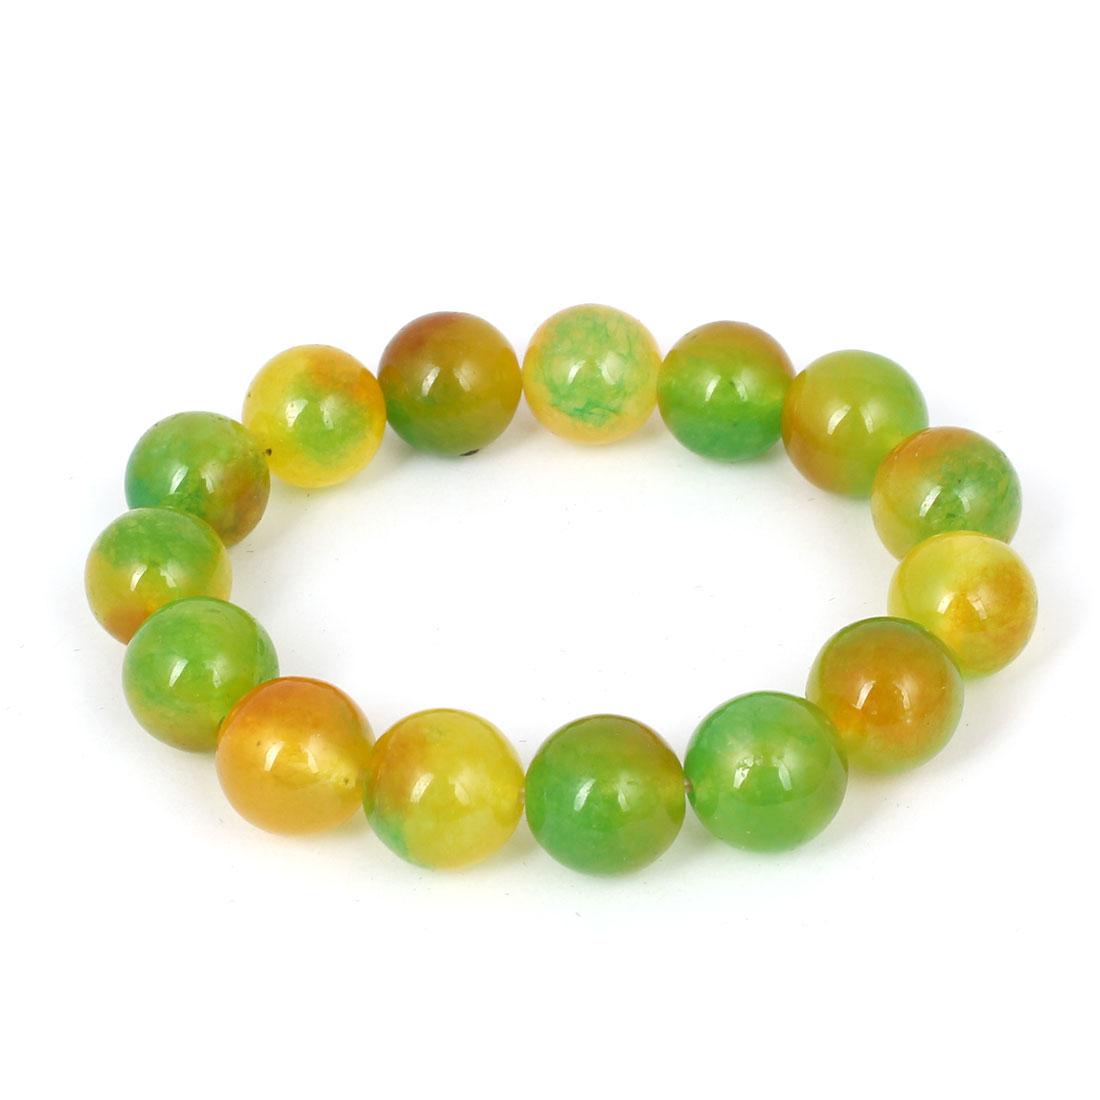 Men Women Faux Jade Elastic 13mm Round Bead Chain Bangle Bracelet Yellow Green